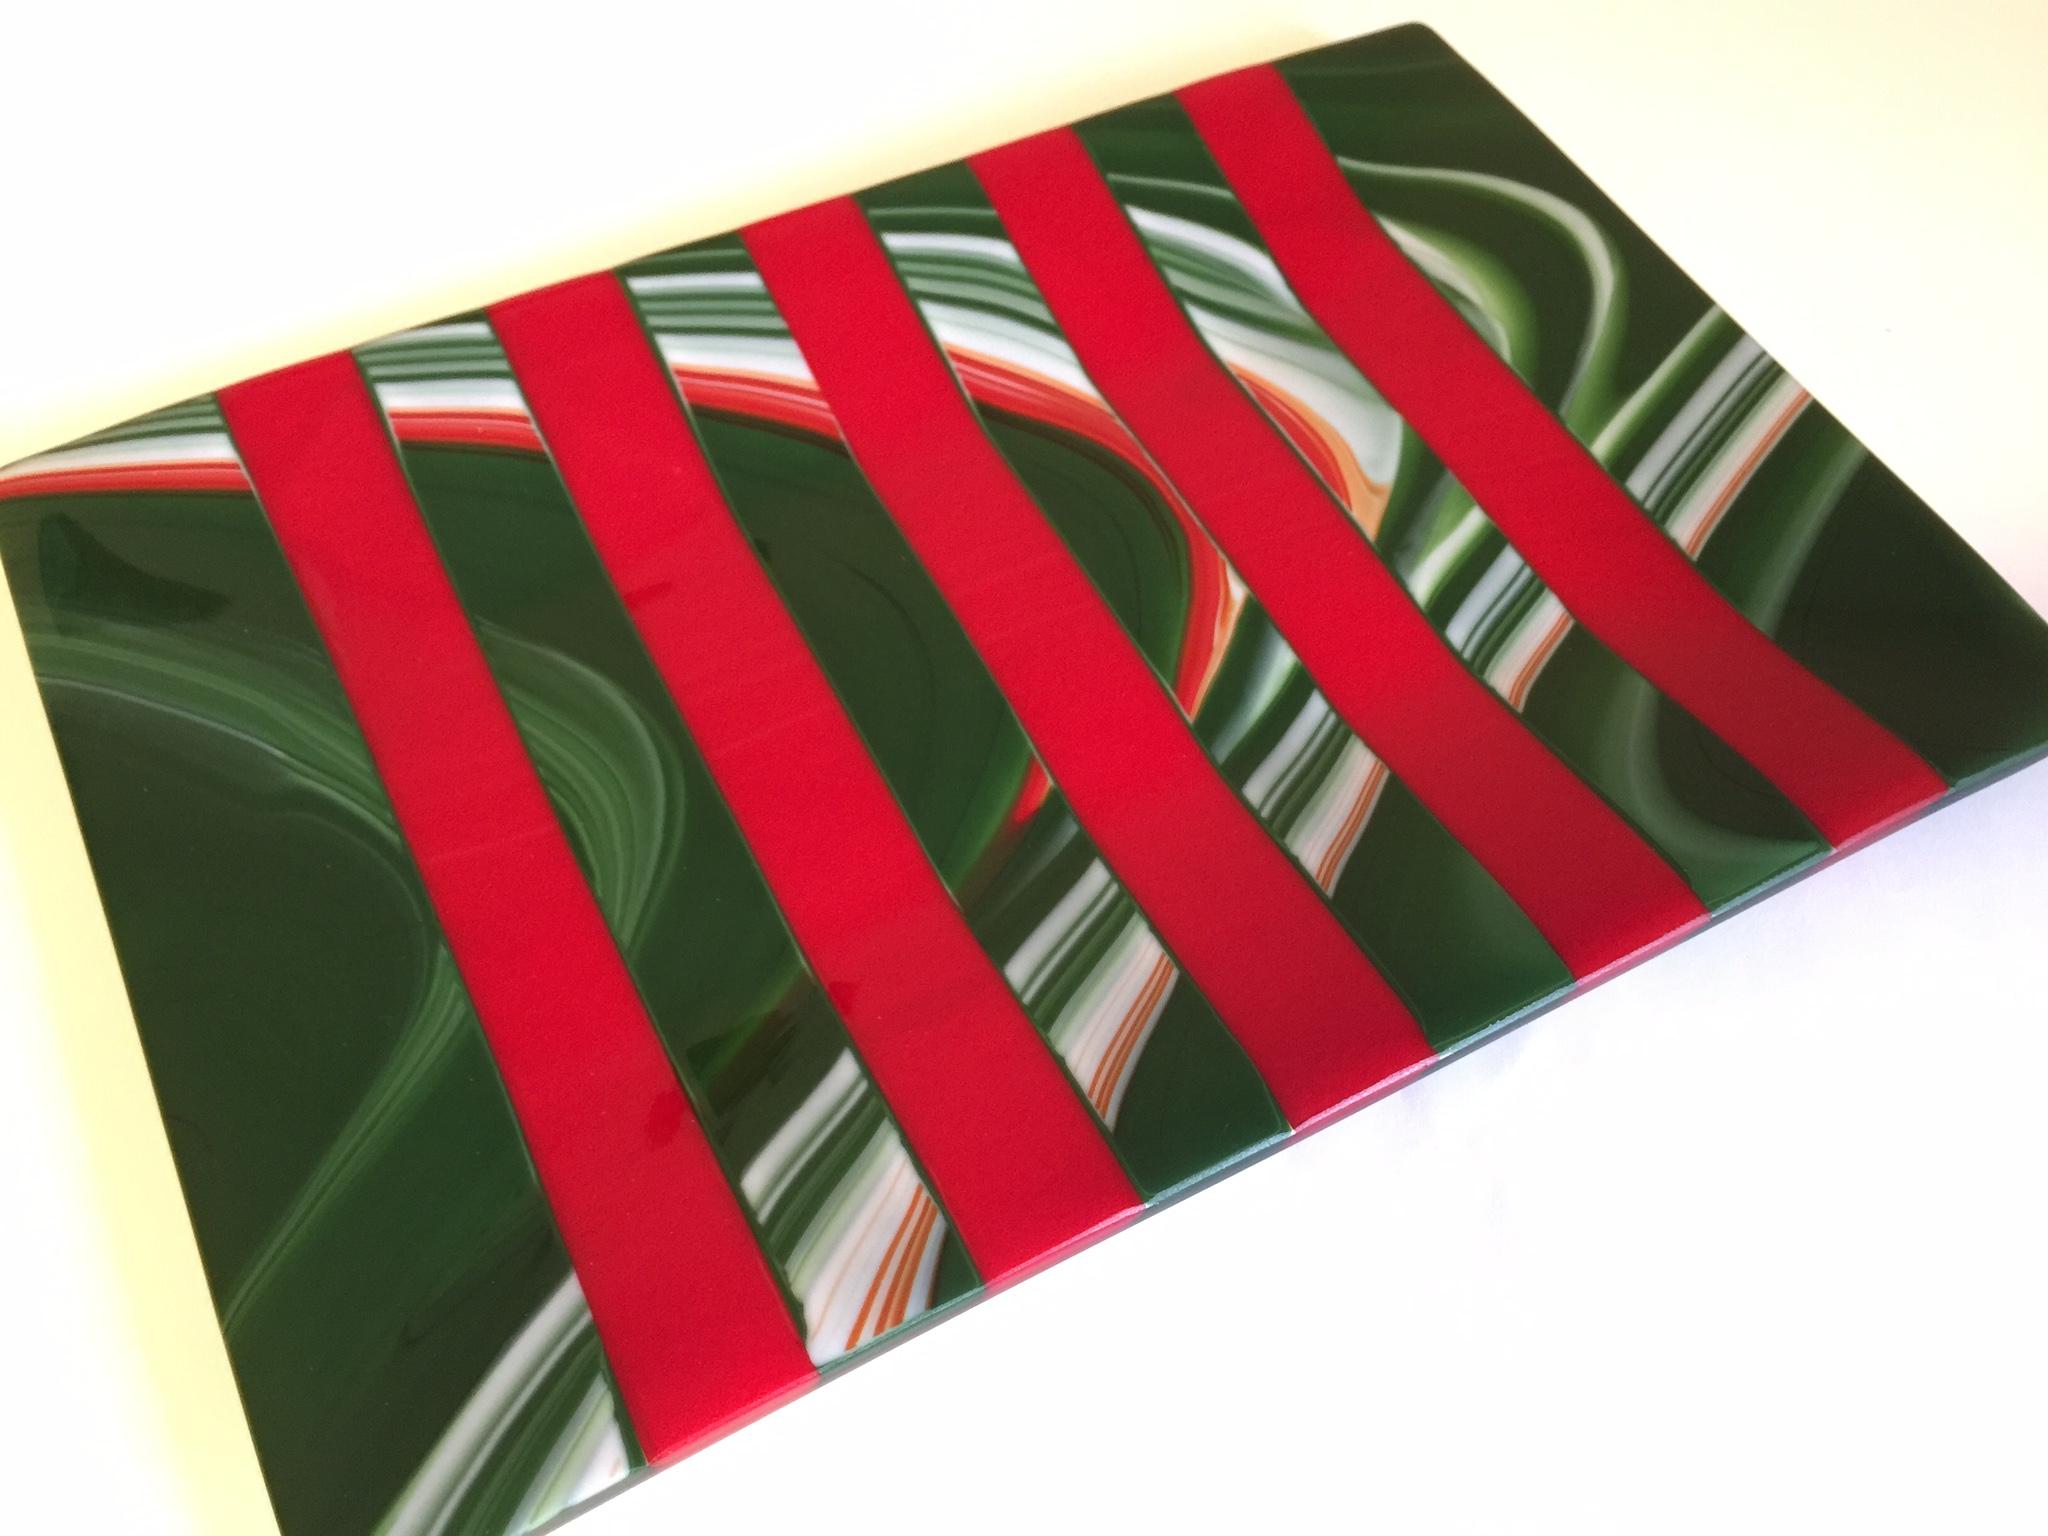 Sarah Dionne Holiday Platter II, 8x13x1, $60.jpg